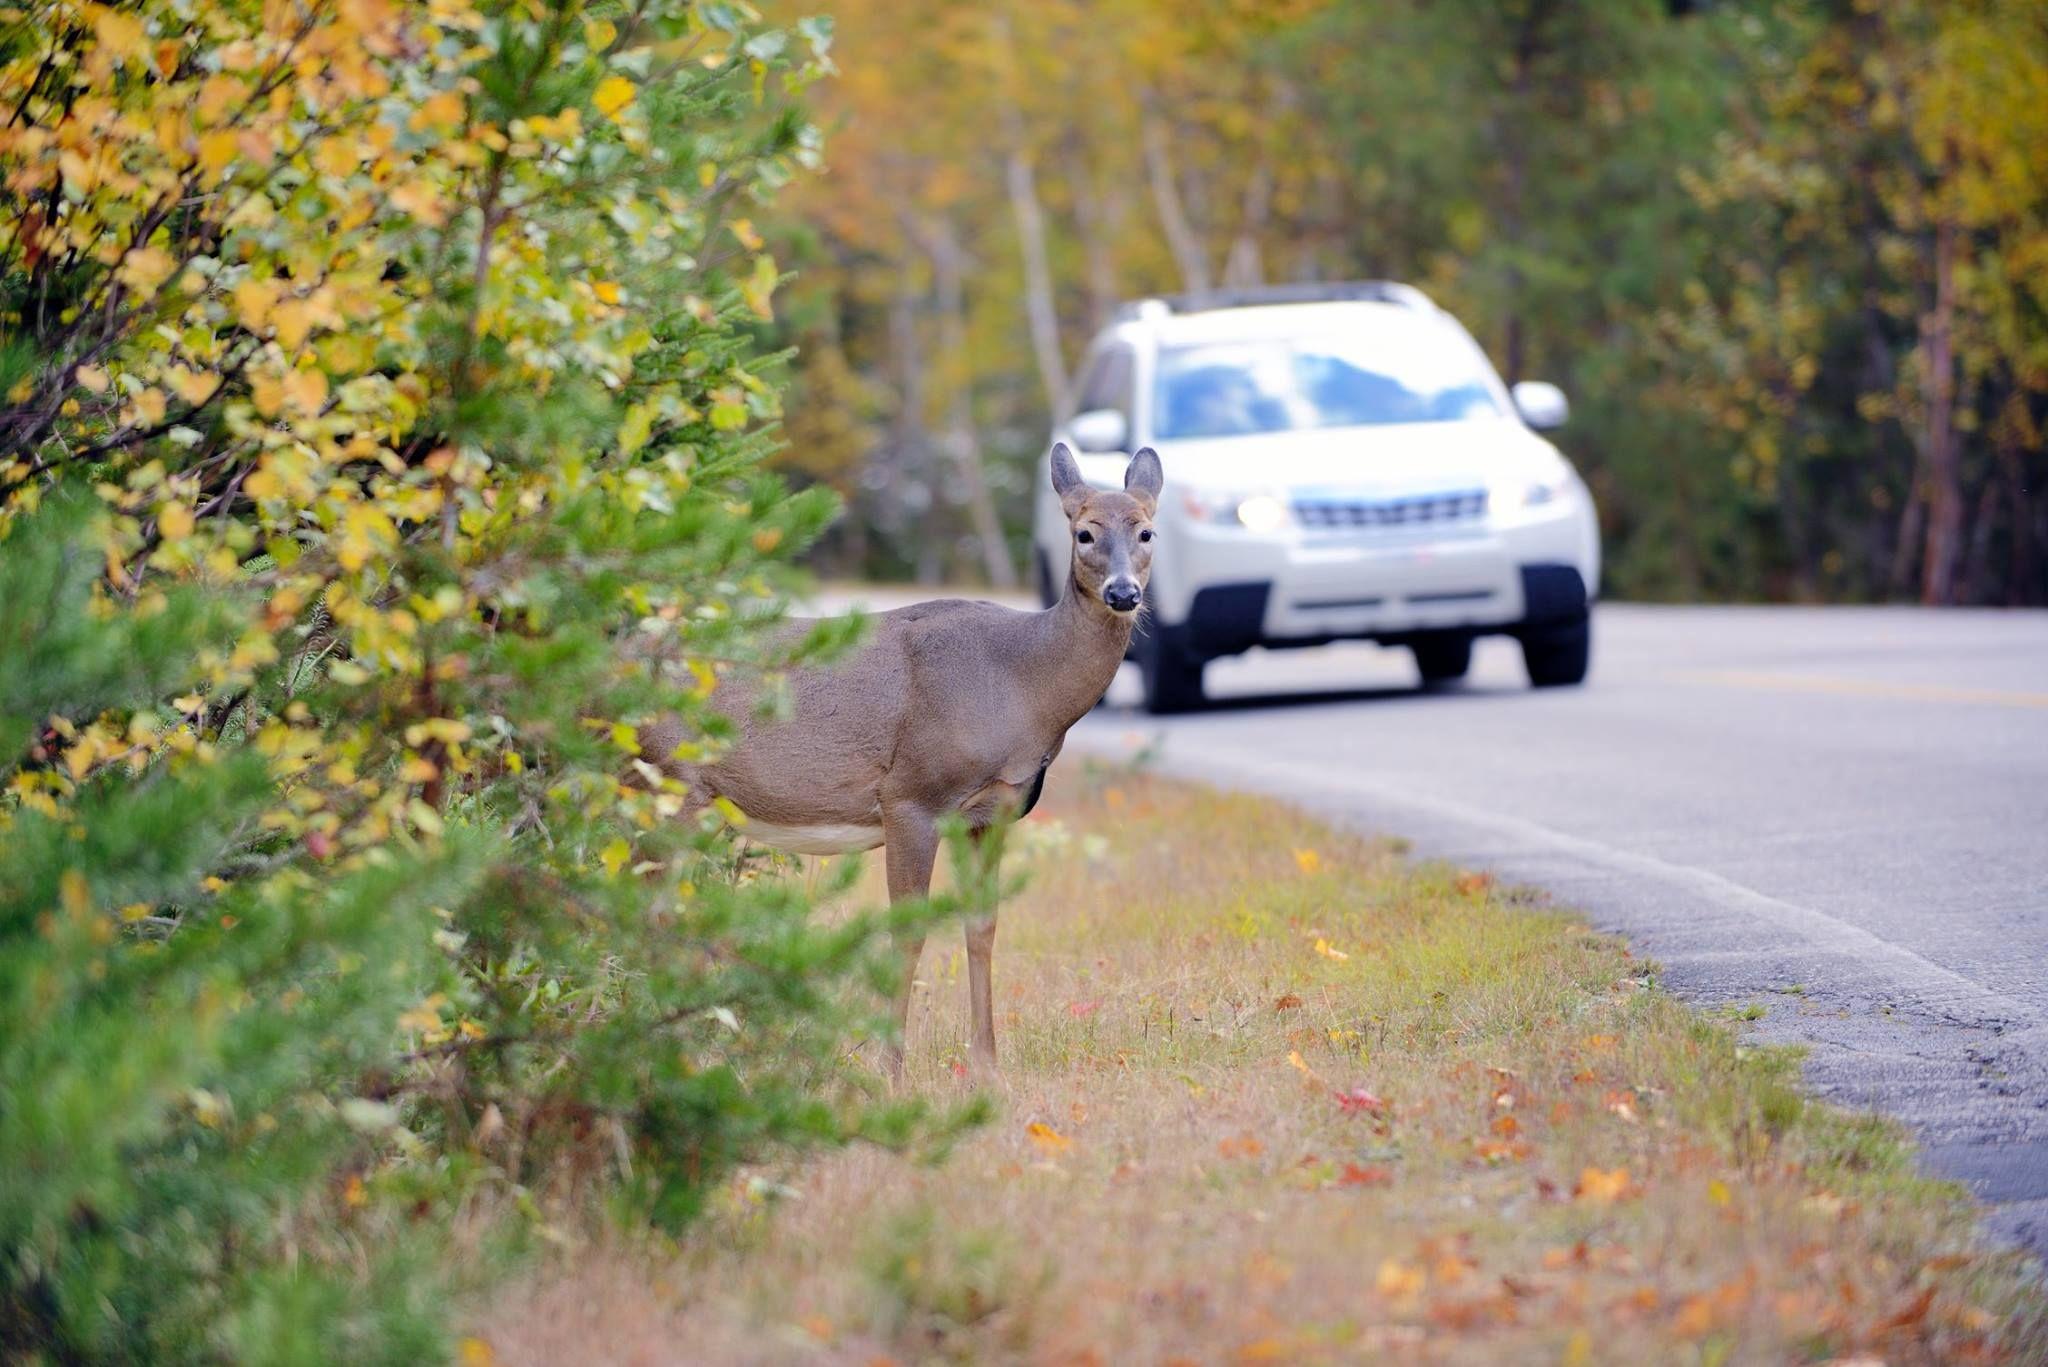 November has the most deervehicle crashes. Ohio drivers